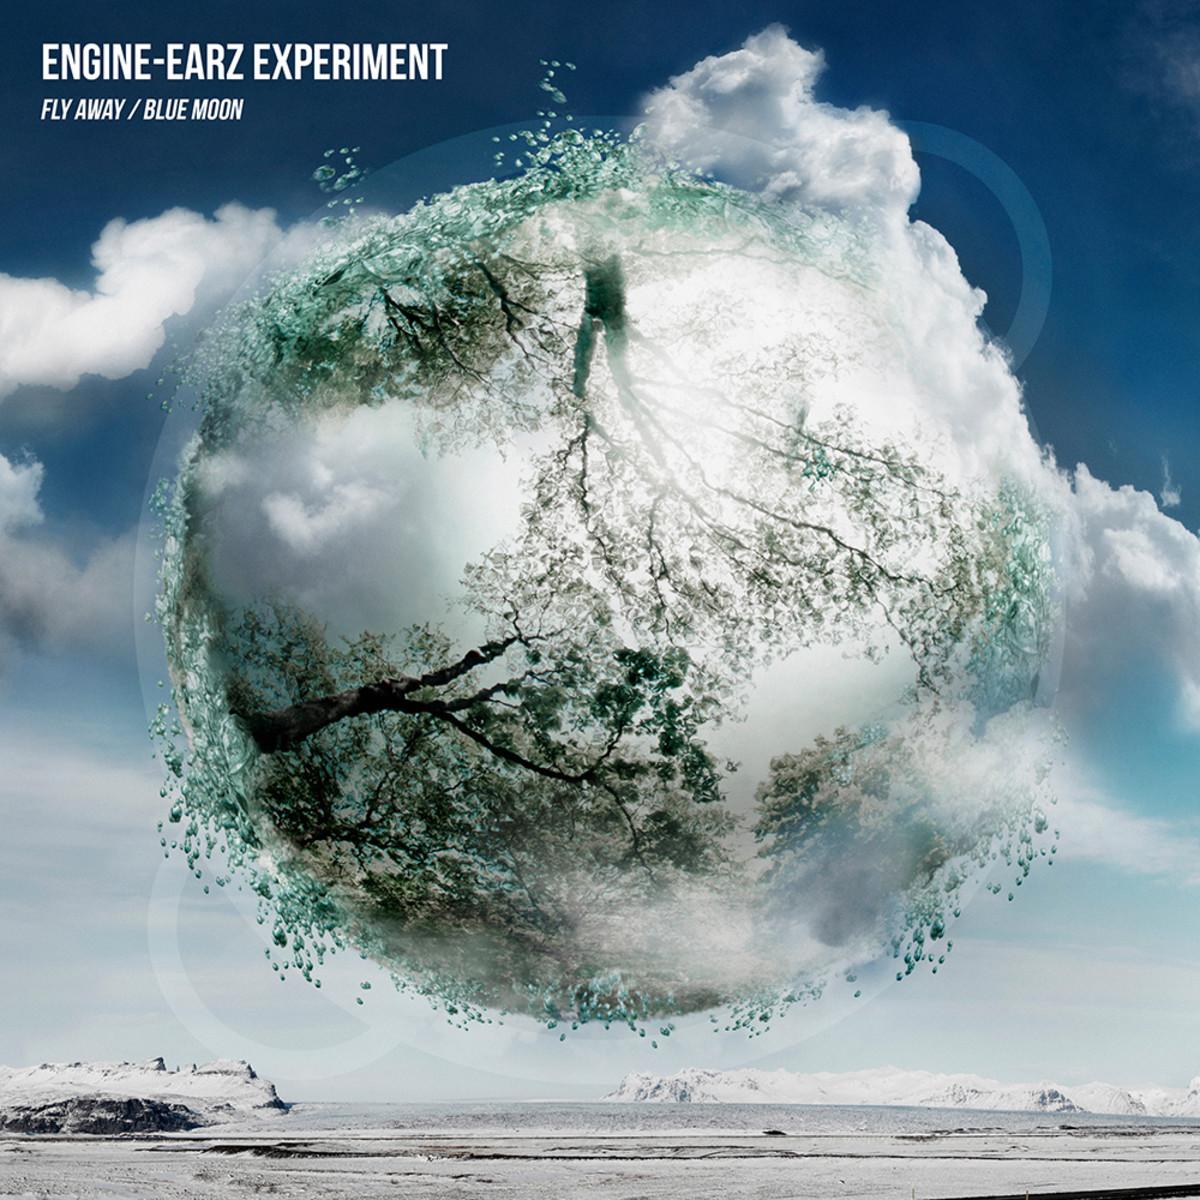 CR086-EngineEarzExperiment-FlyAway-BlueMoon-1000